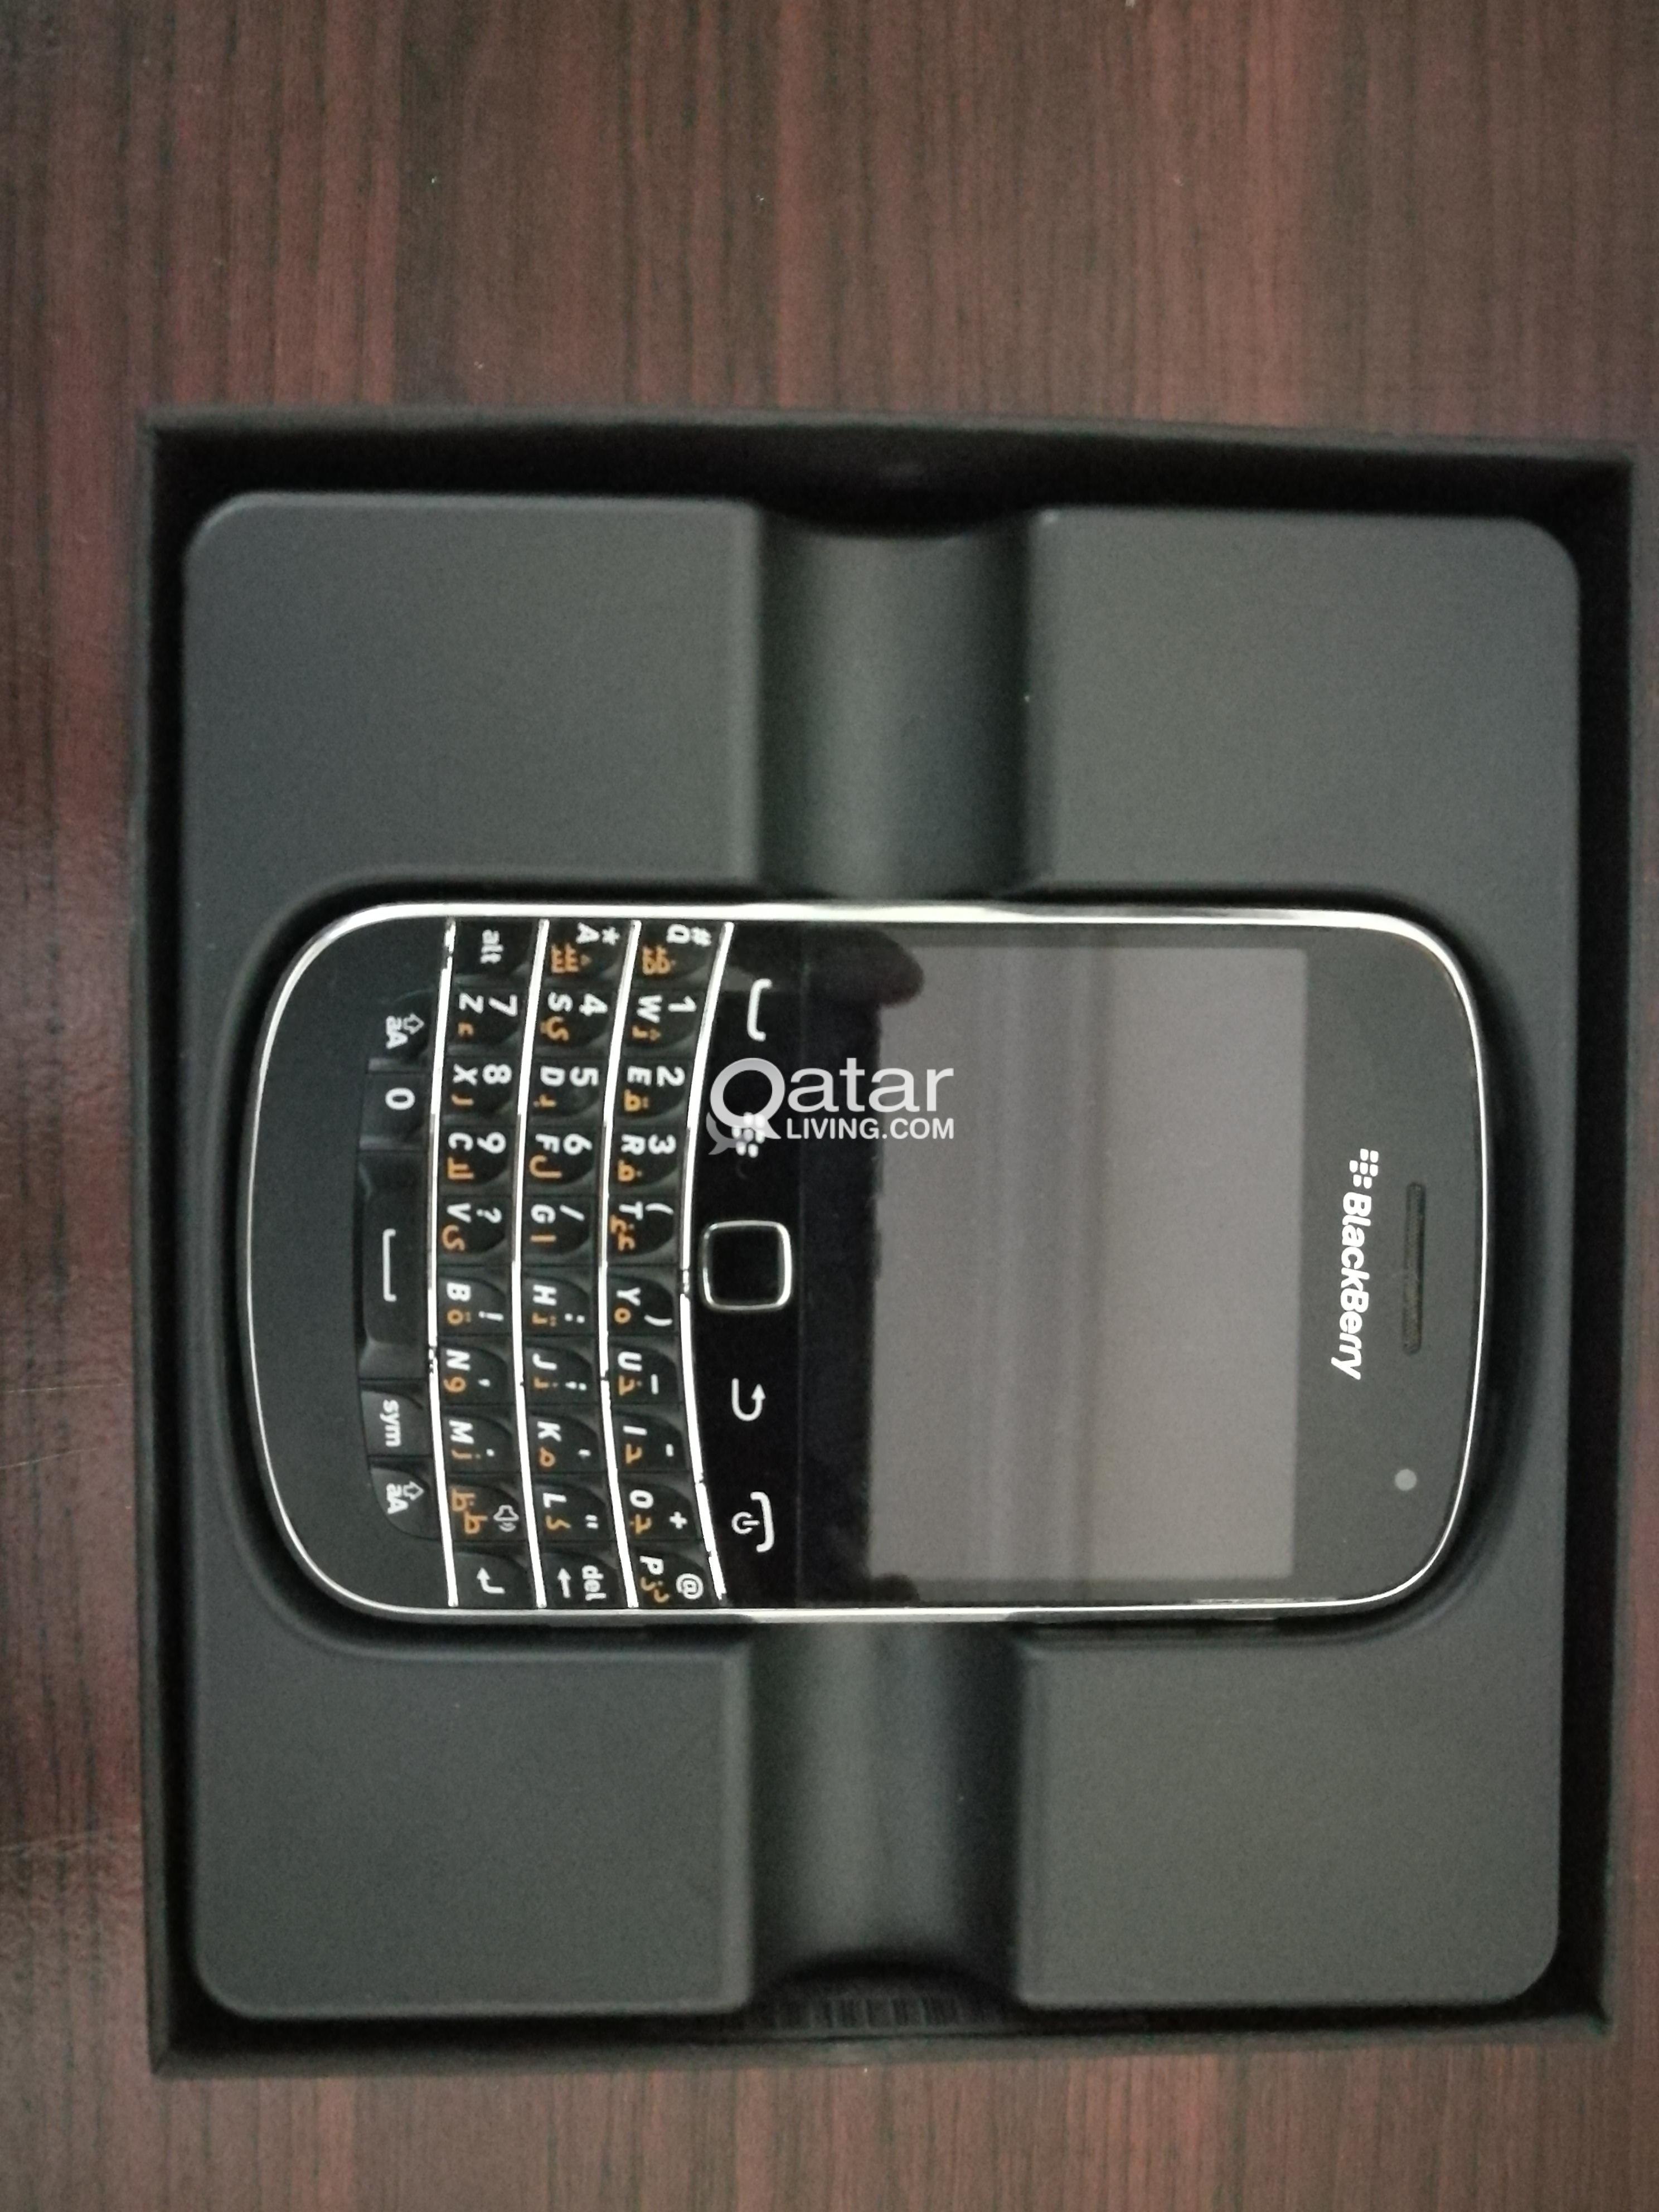 BlackBerry Bold 9900 for sale | Qatar Living